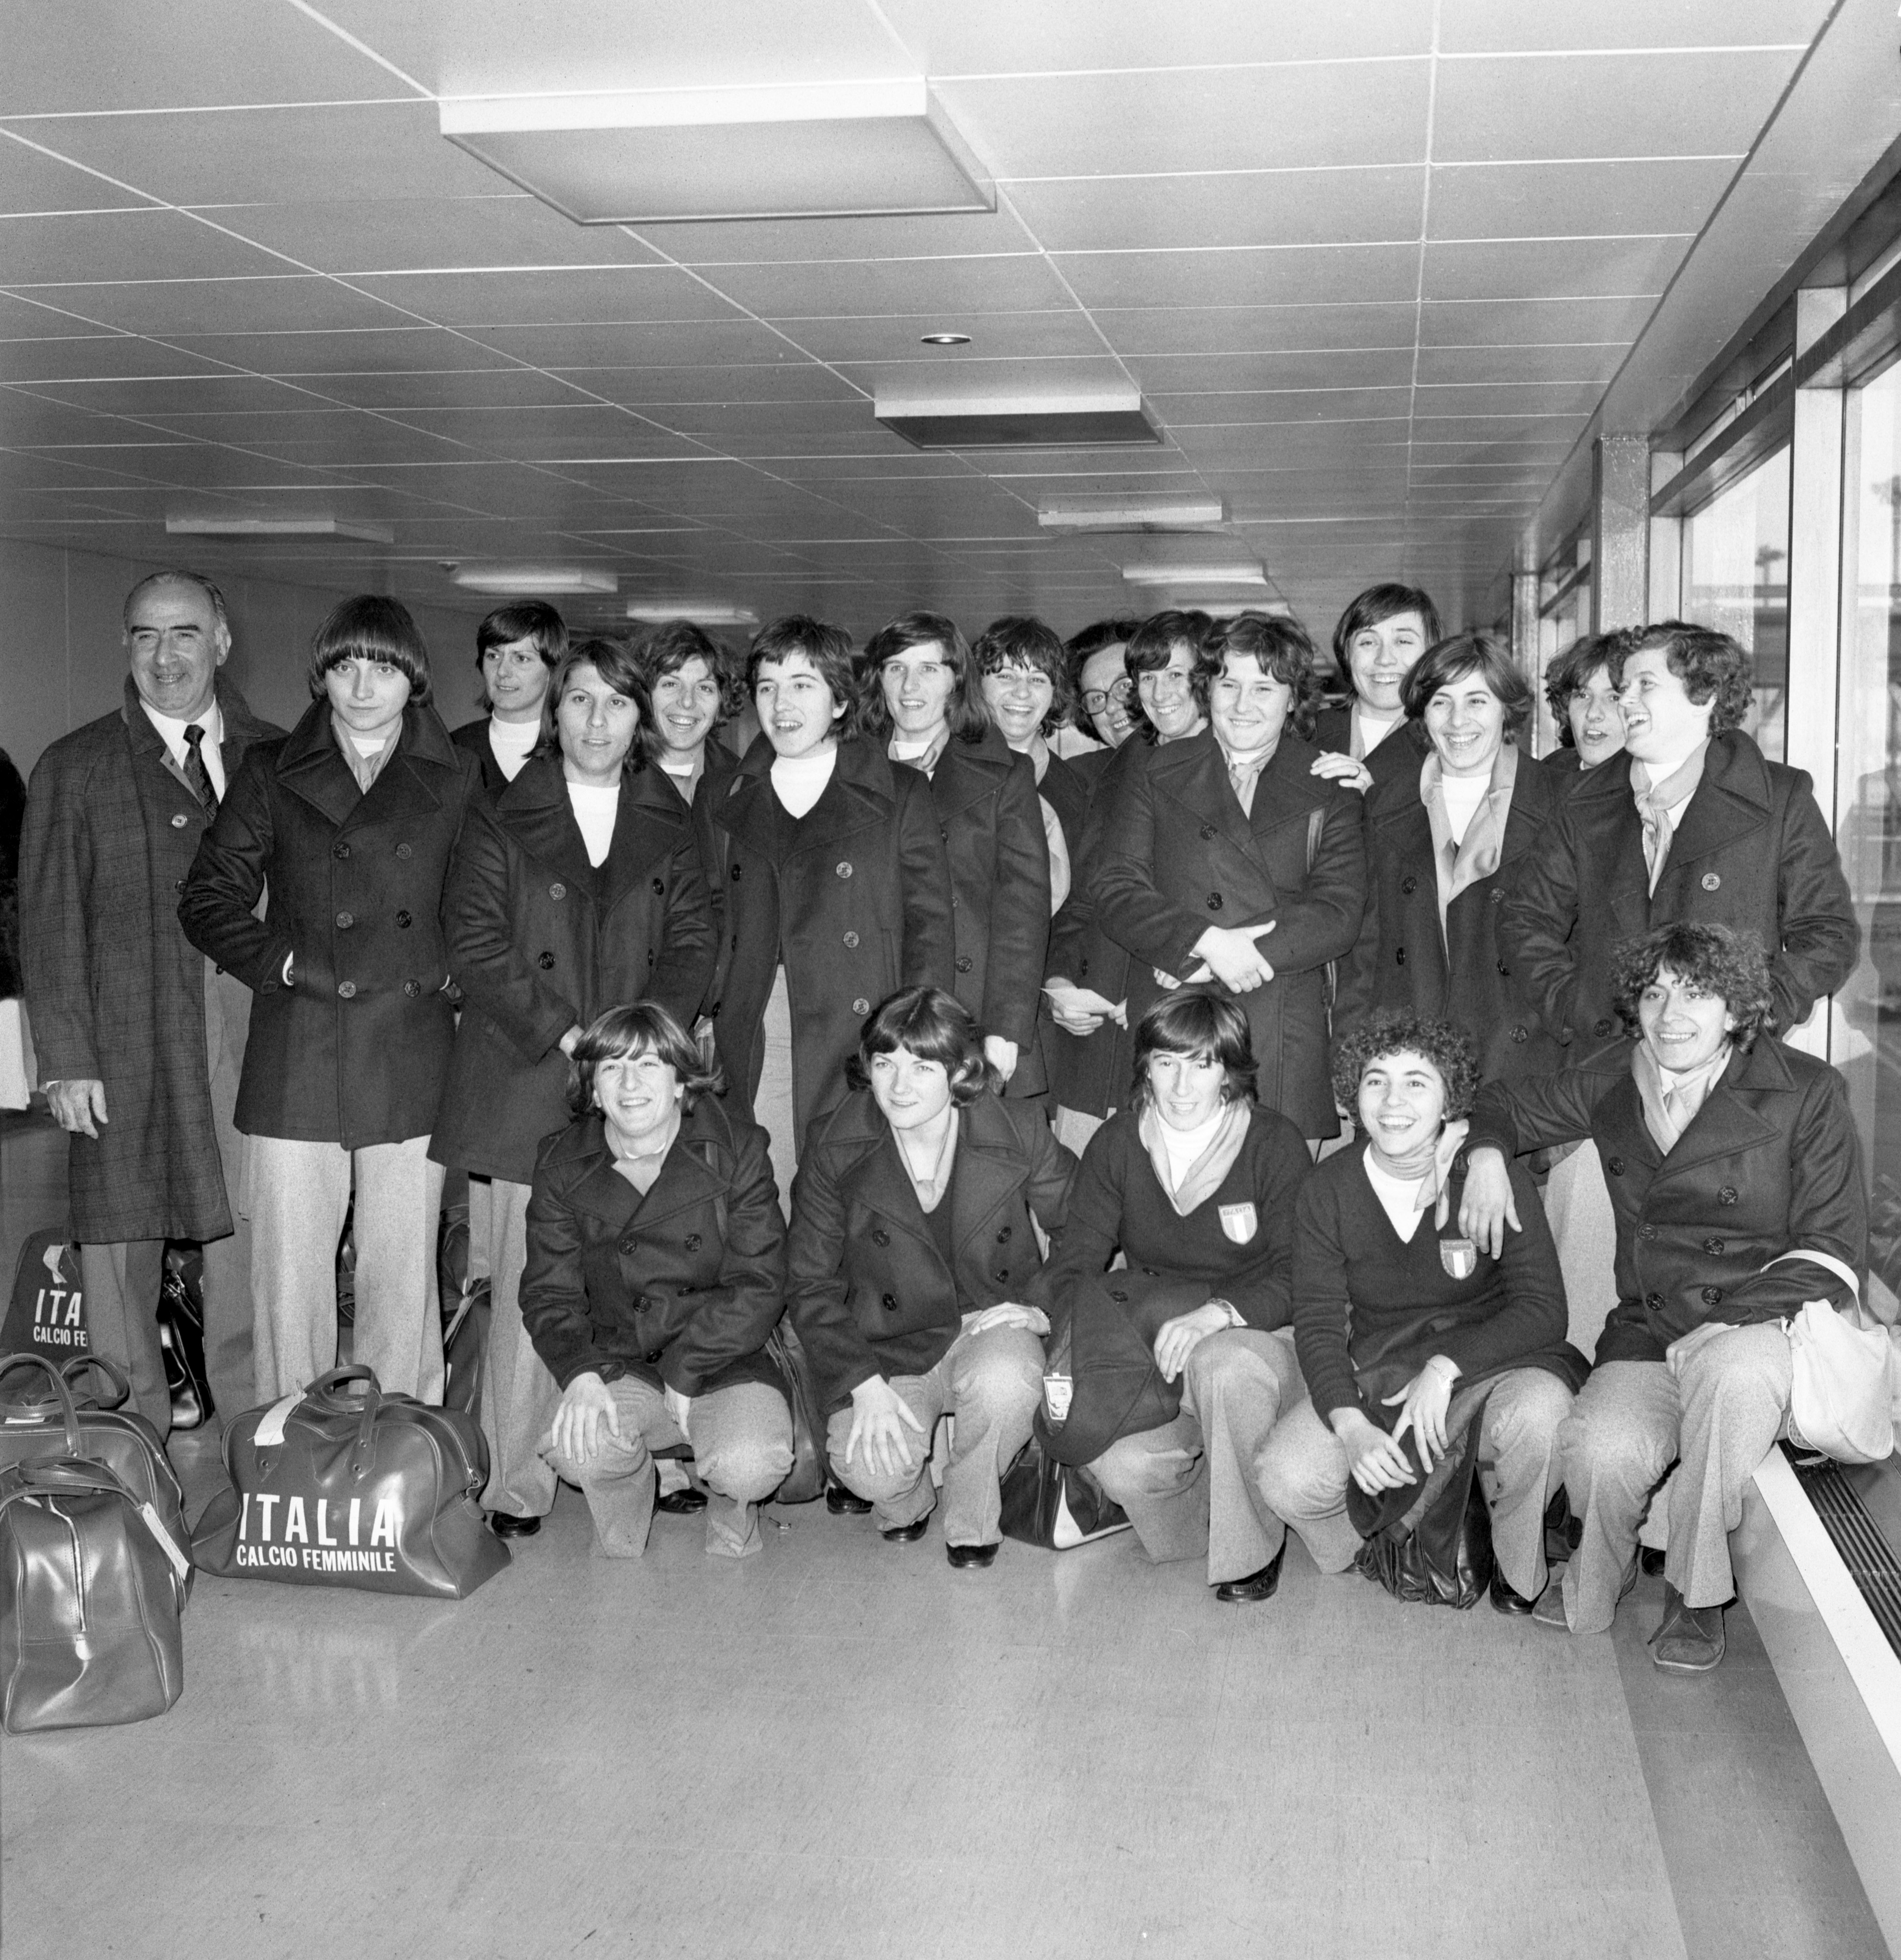 Soccer - Italy Women's Team - Heathrow Airport, London